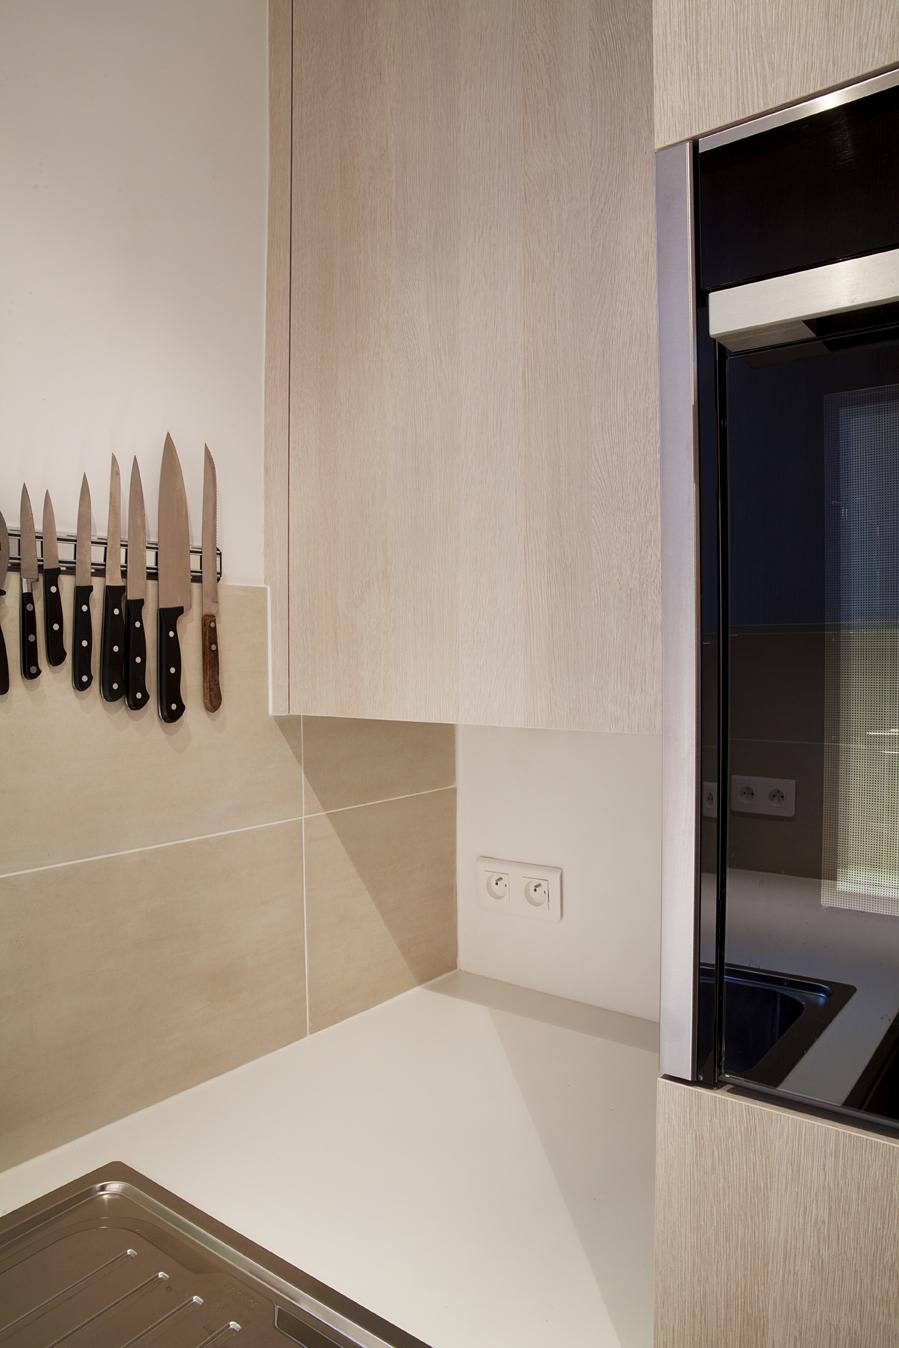 petite cuisine lumineuse rangement couteau